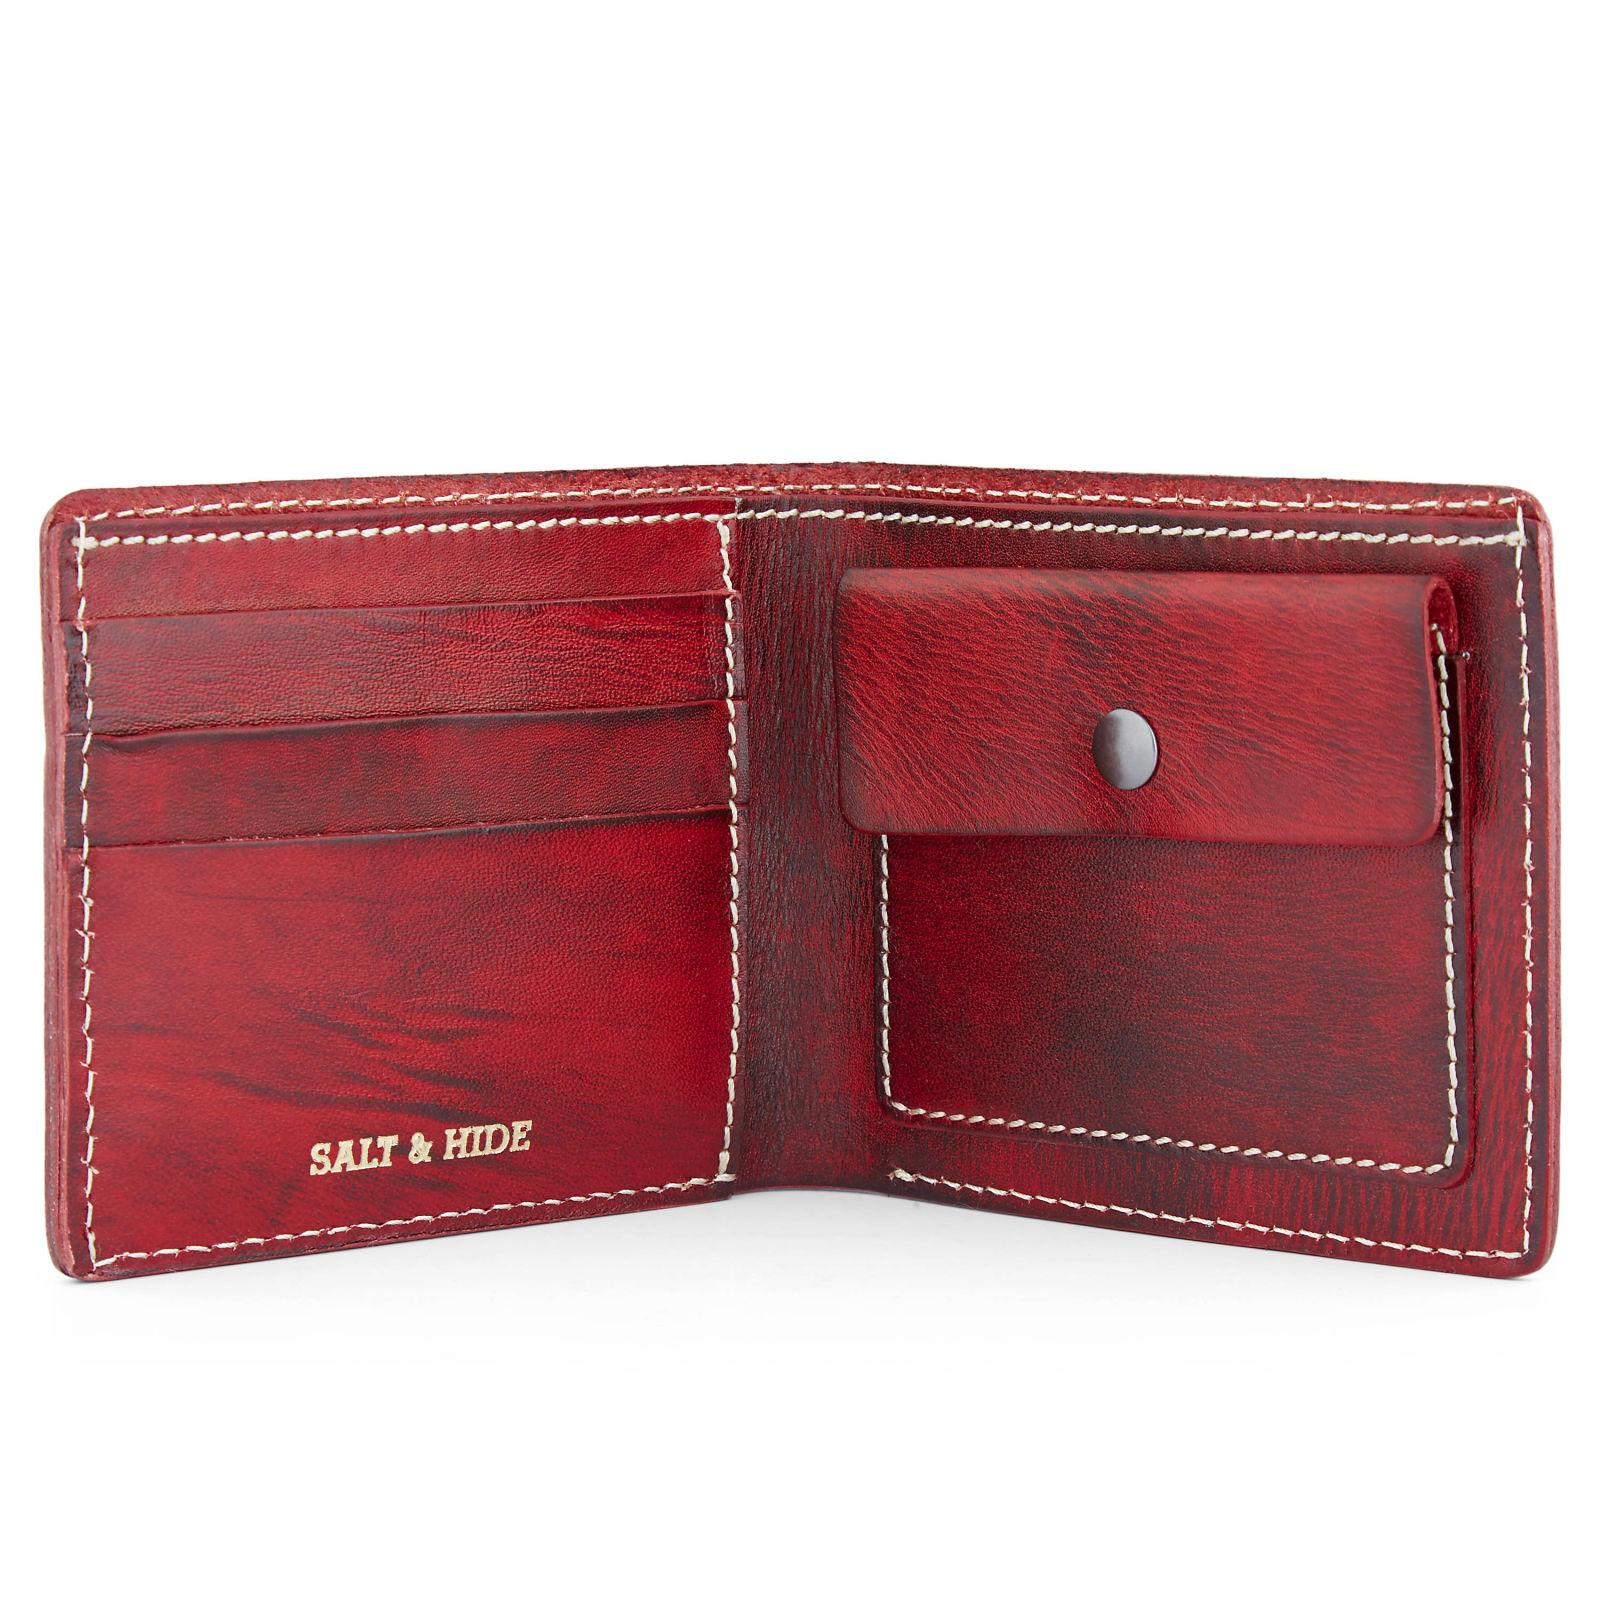 d22ed1668a Κόκκινο Δίπτυχο Δερμάτινο Πορτοφόλι Dermot